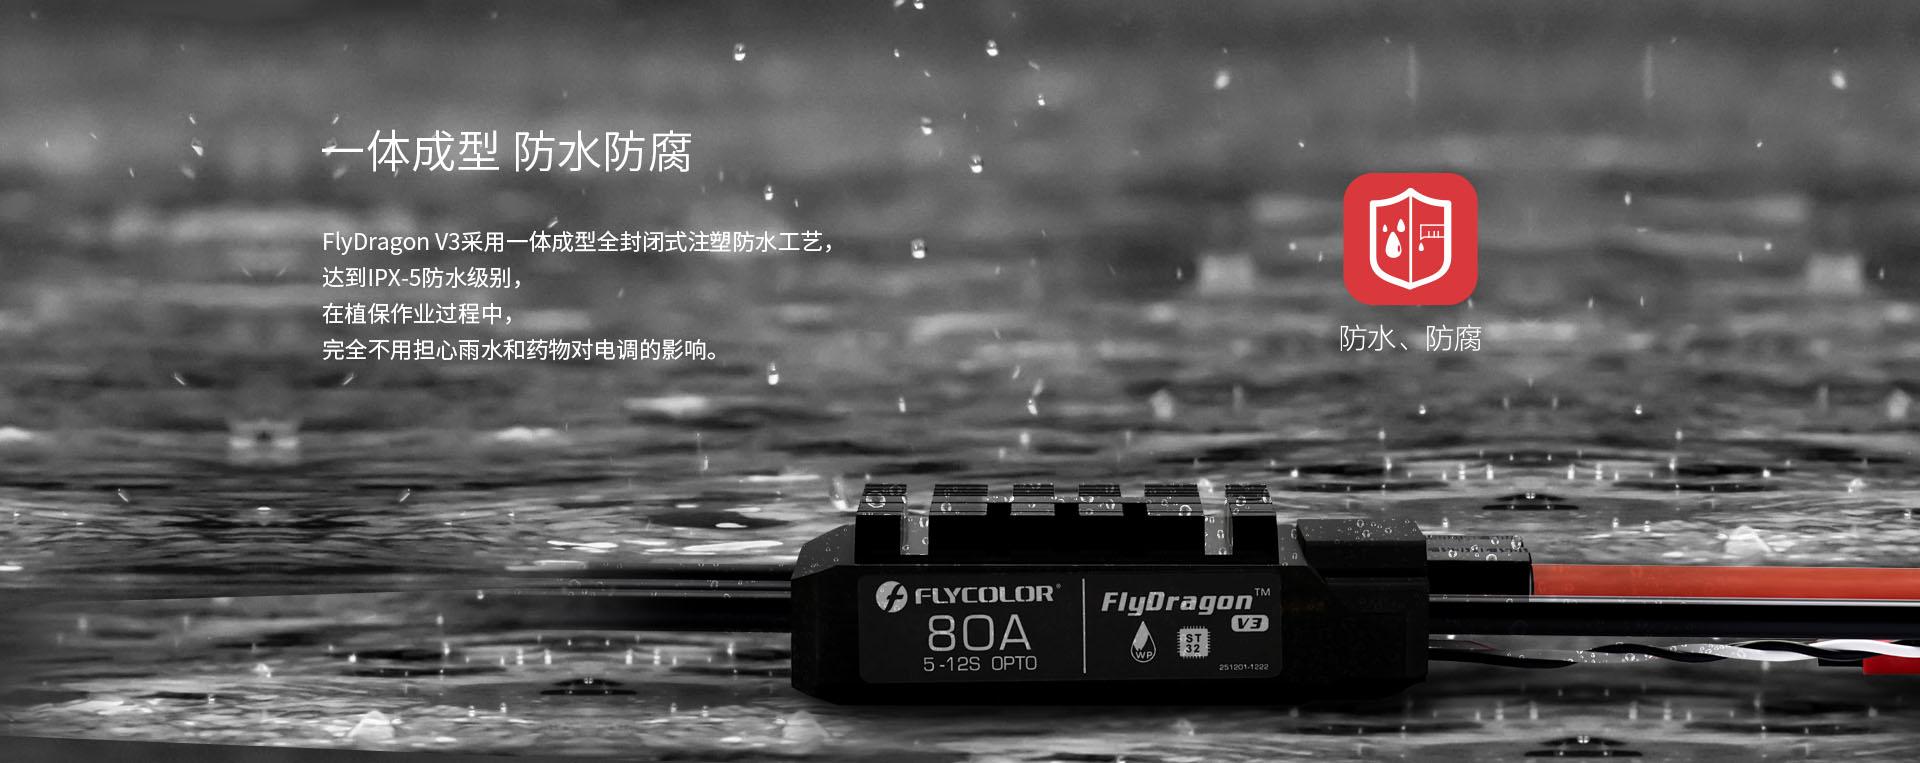 img-1-防水防腐.jpg